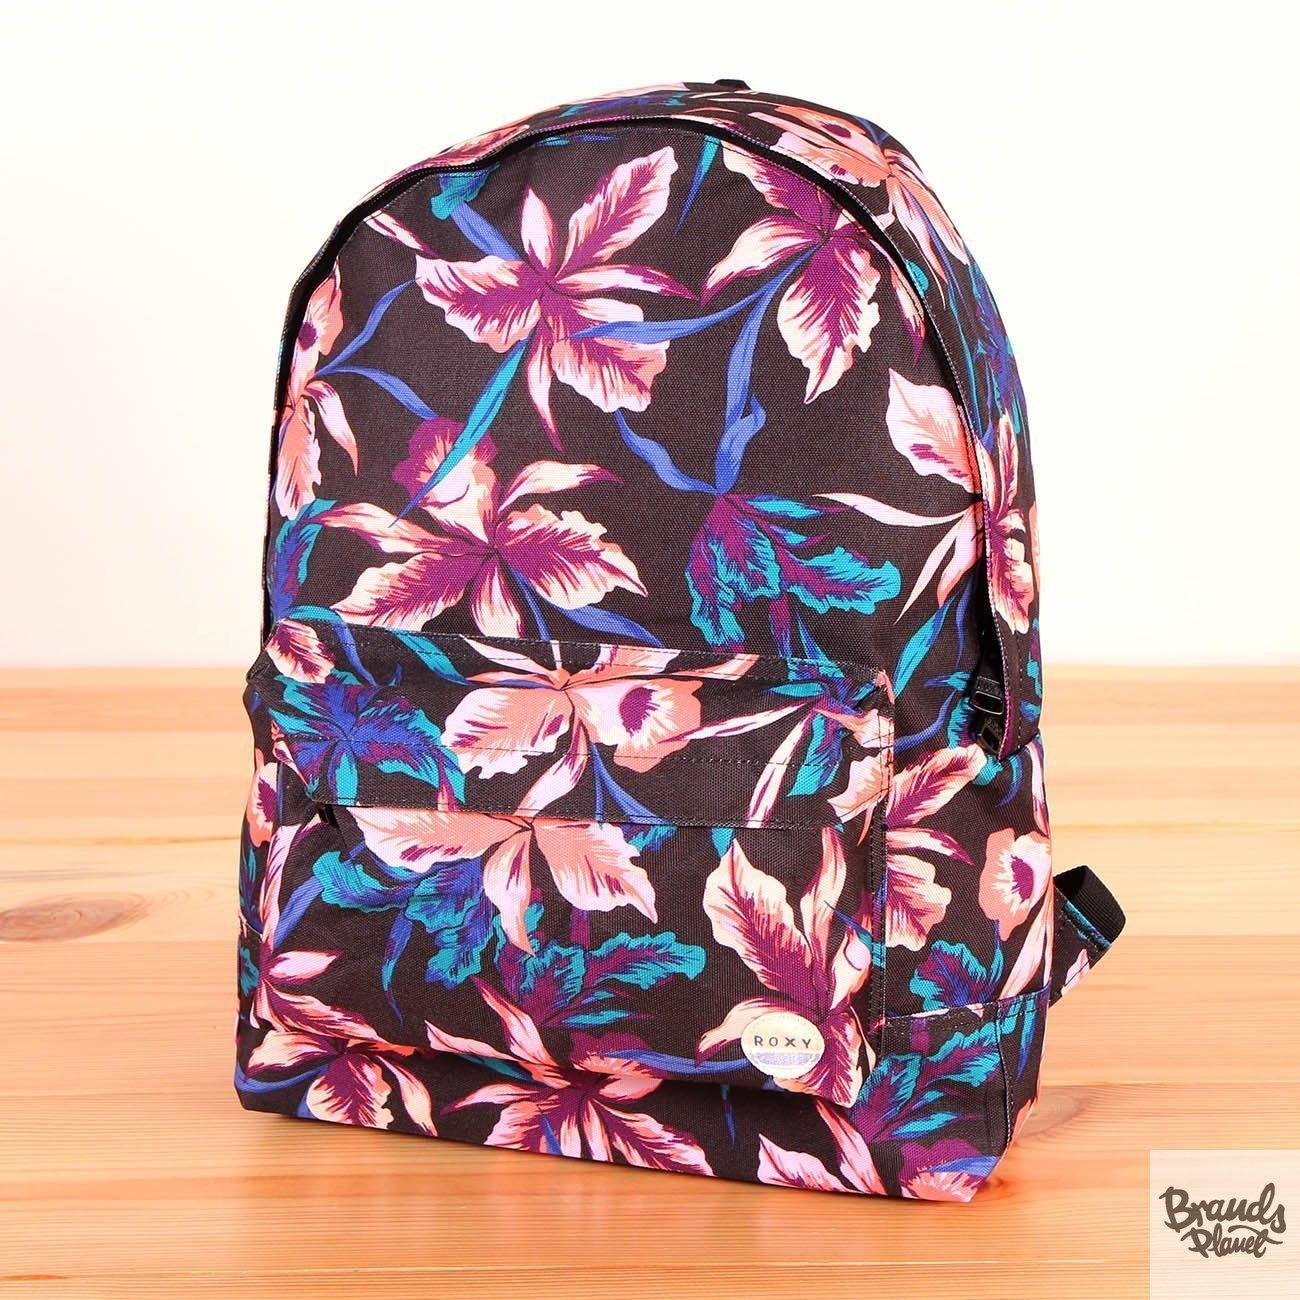 effc0385605a4 Plecak Dakine Hana Libby 26L · Plecak Roxy Sugar Baby - True Black Maui  Lights